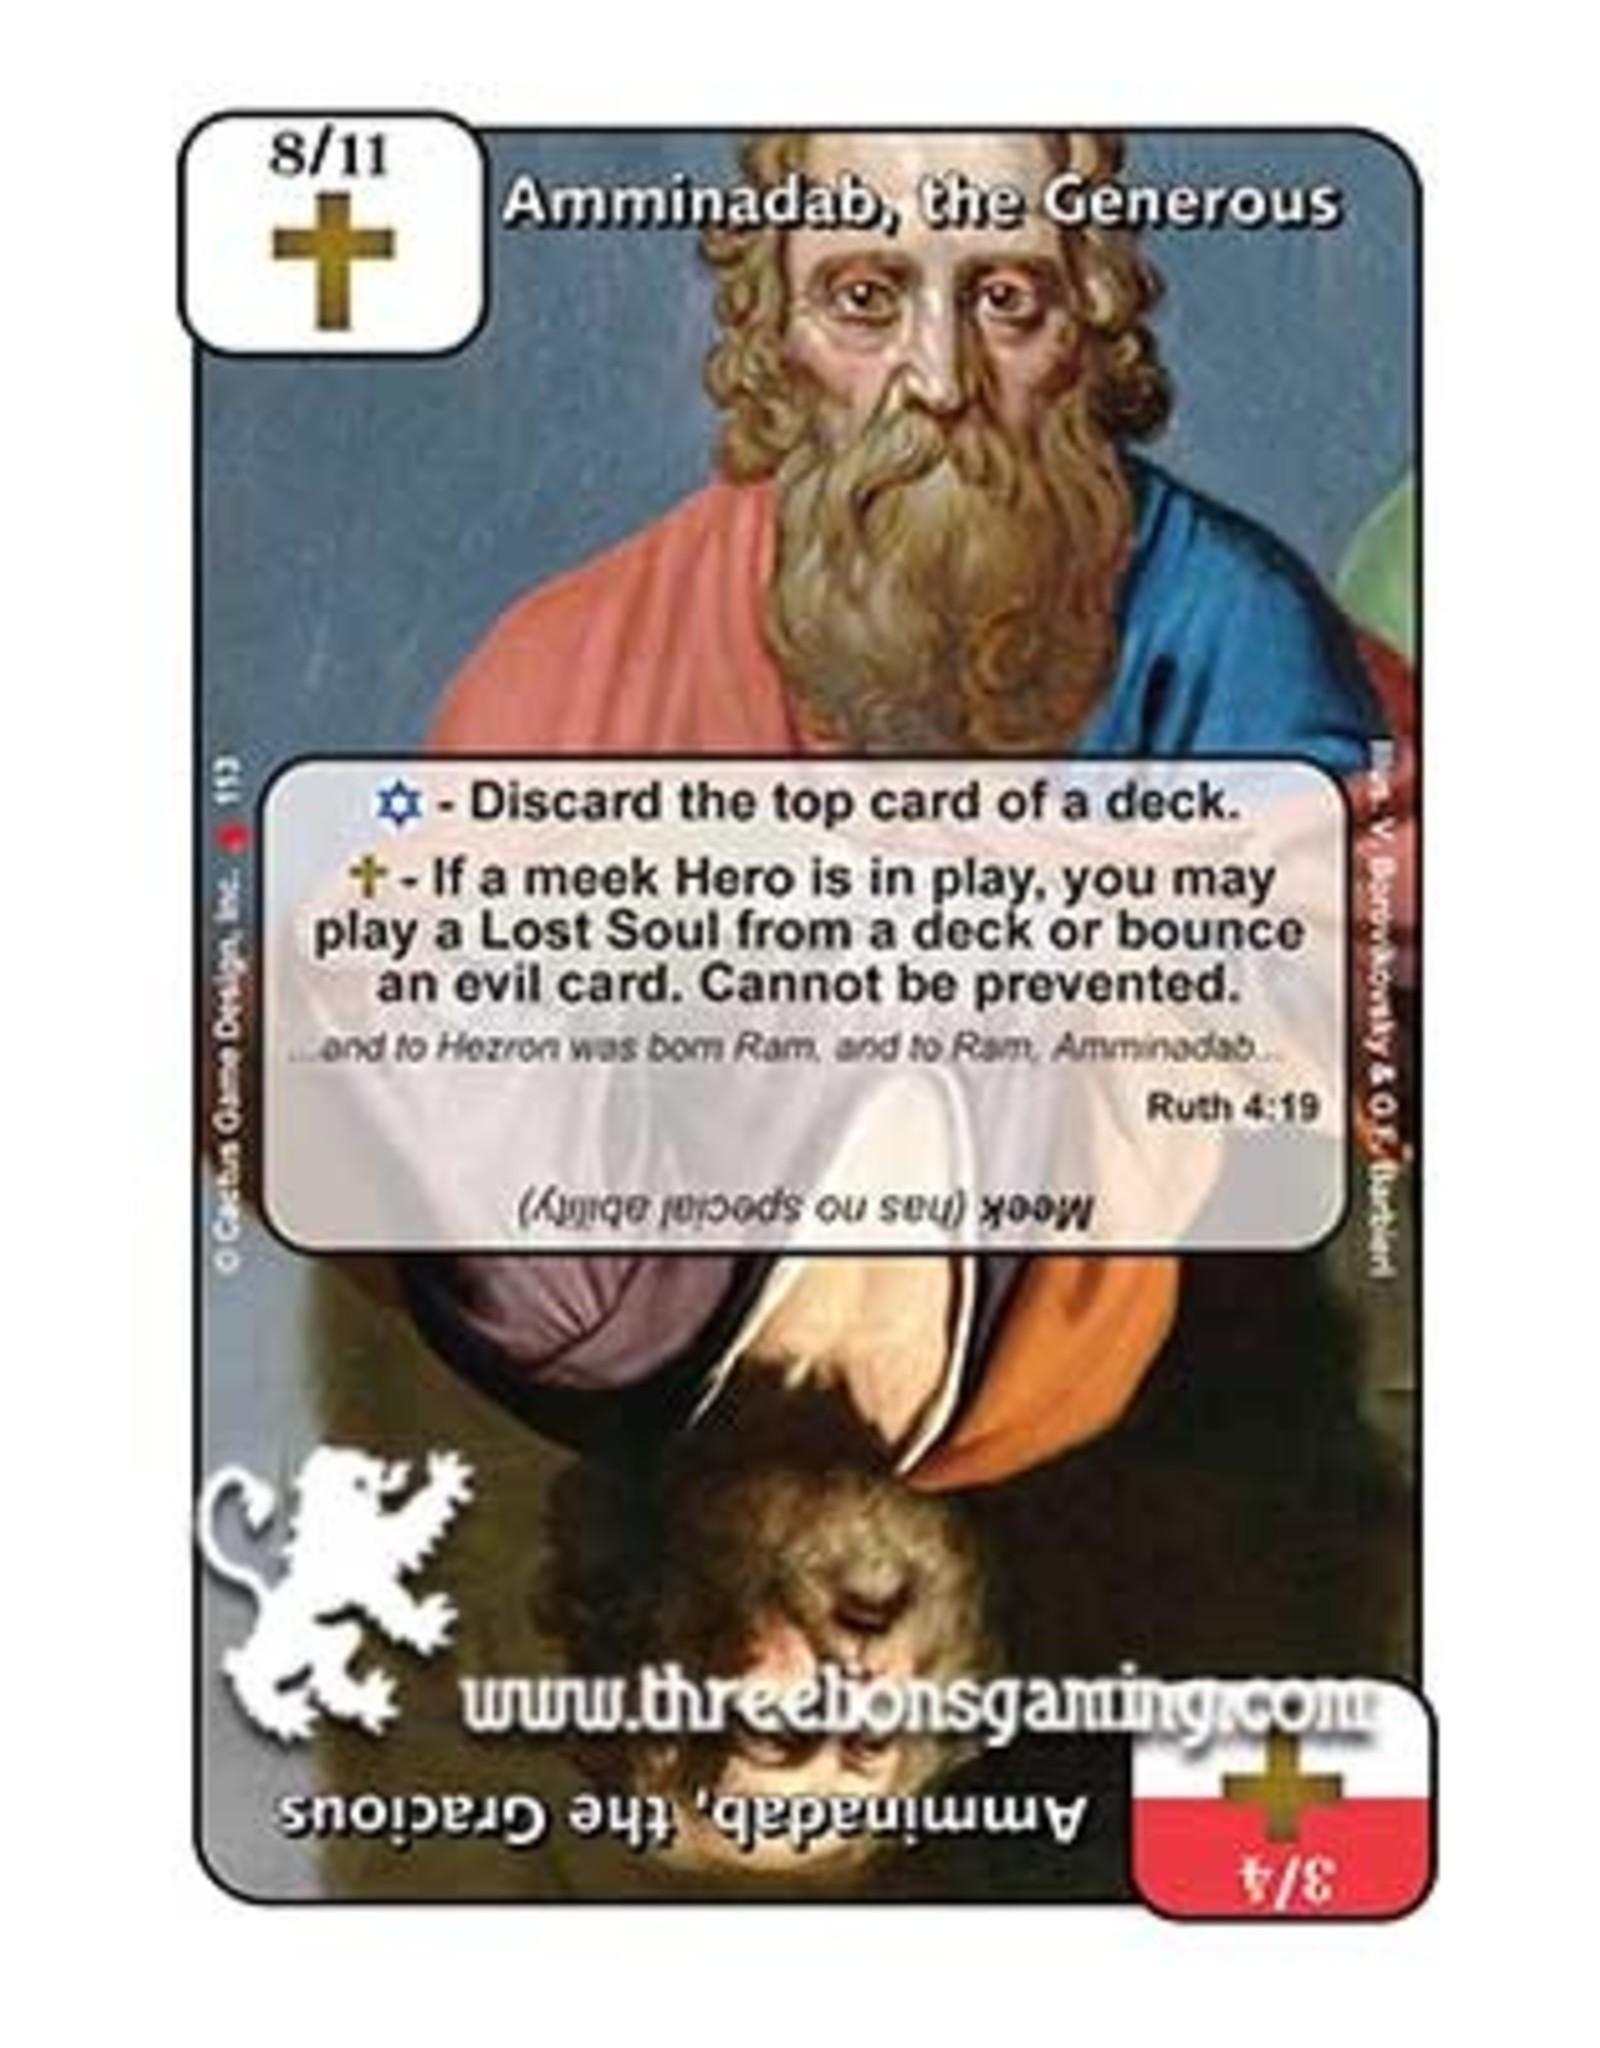 LoC: Amminadab, the Generous / Amminadab, the Gracious